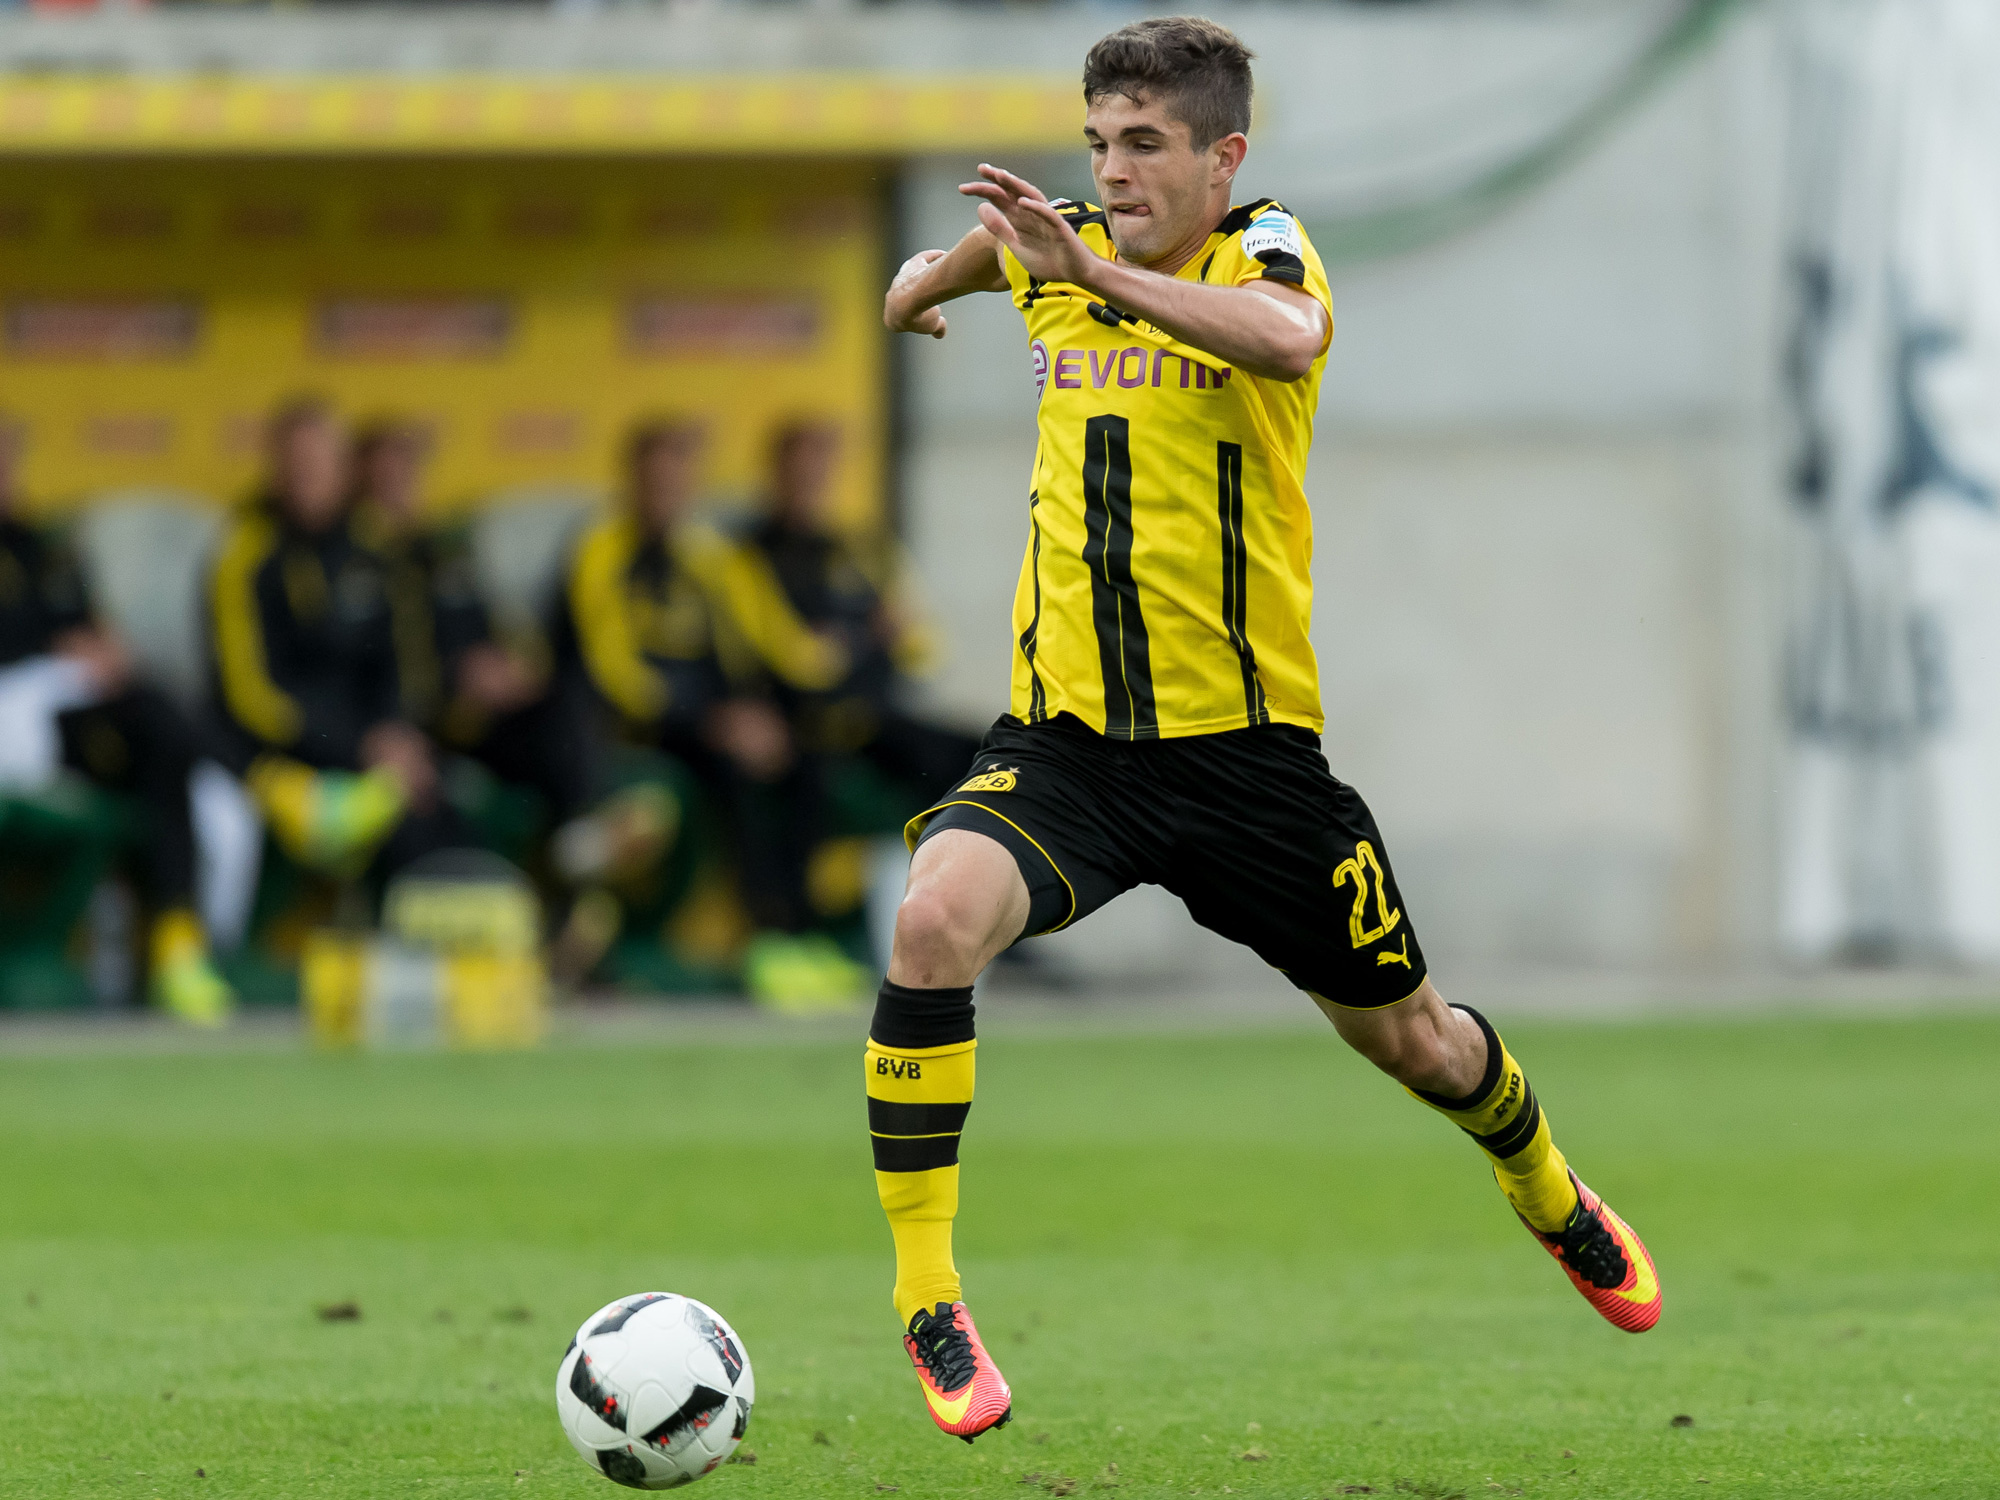 Christian Pulisic coasts down the field for Borussia Dortmund